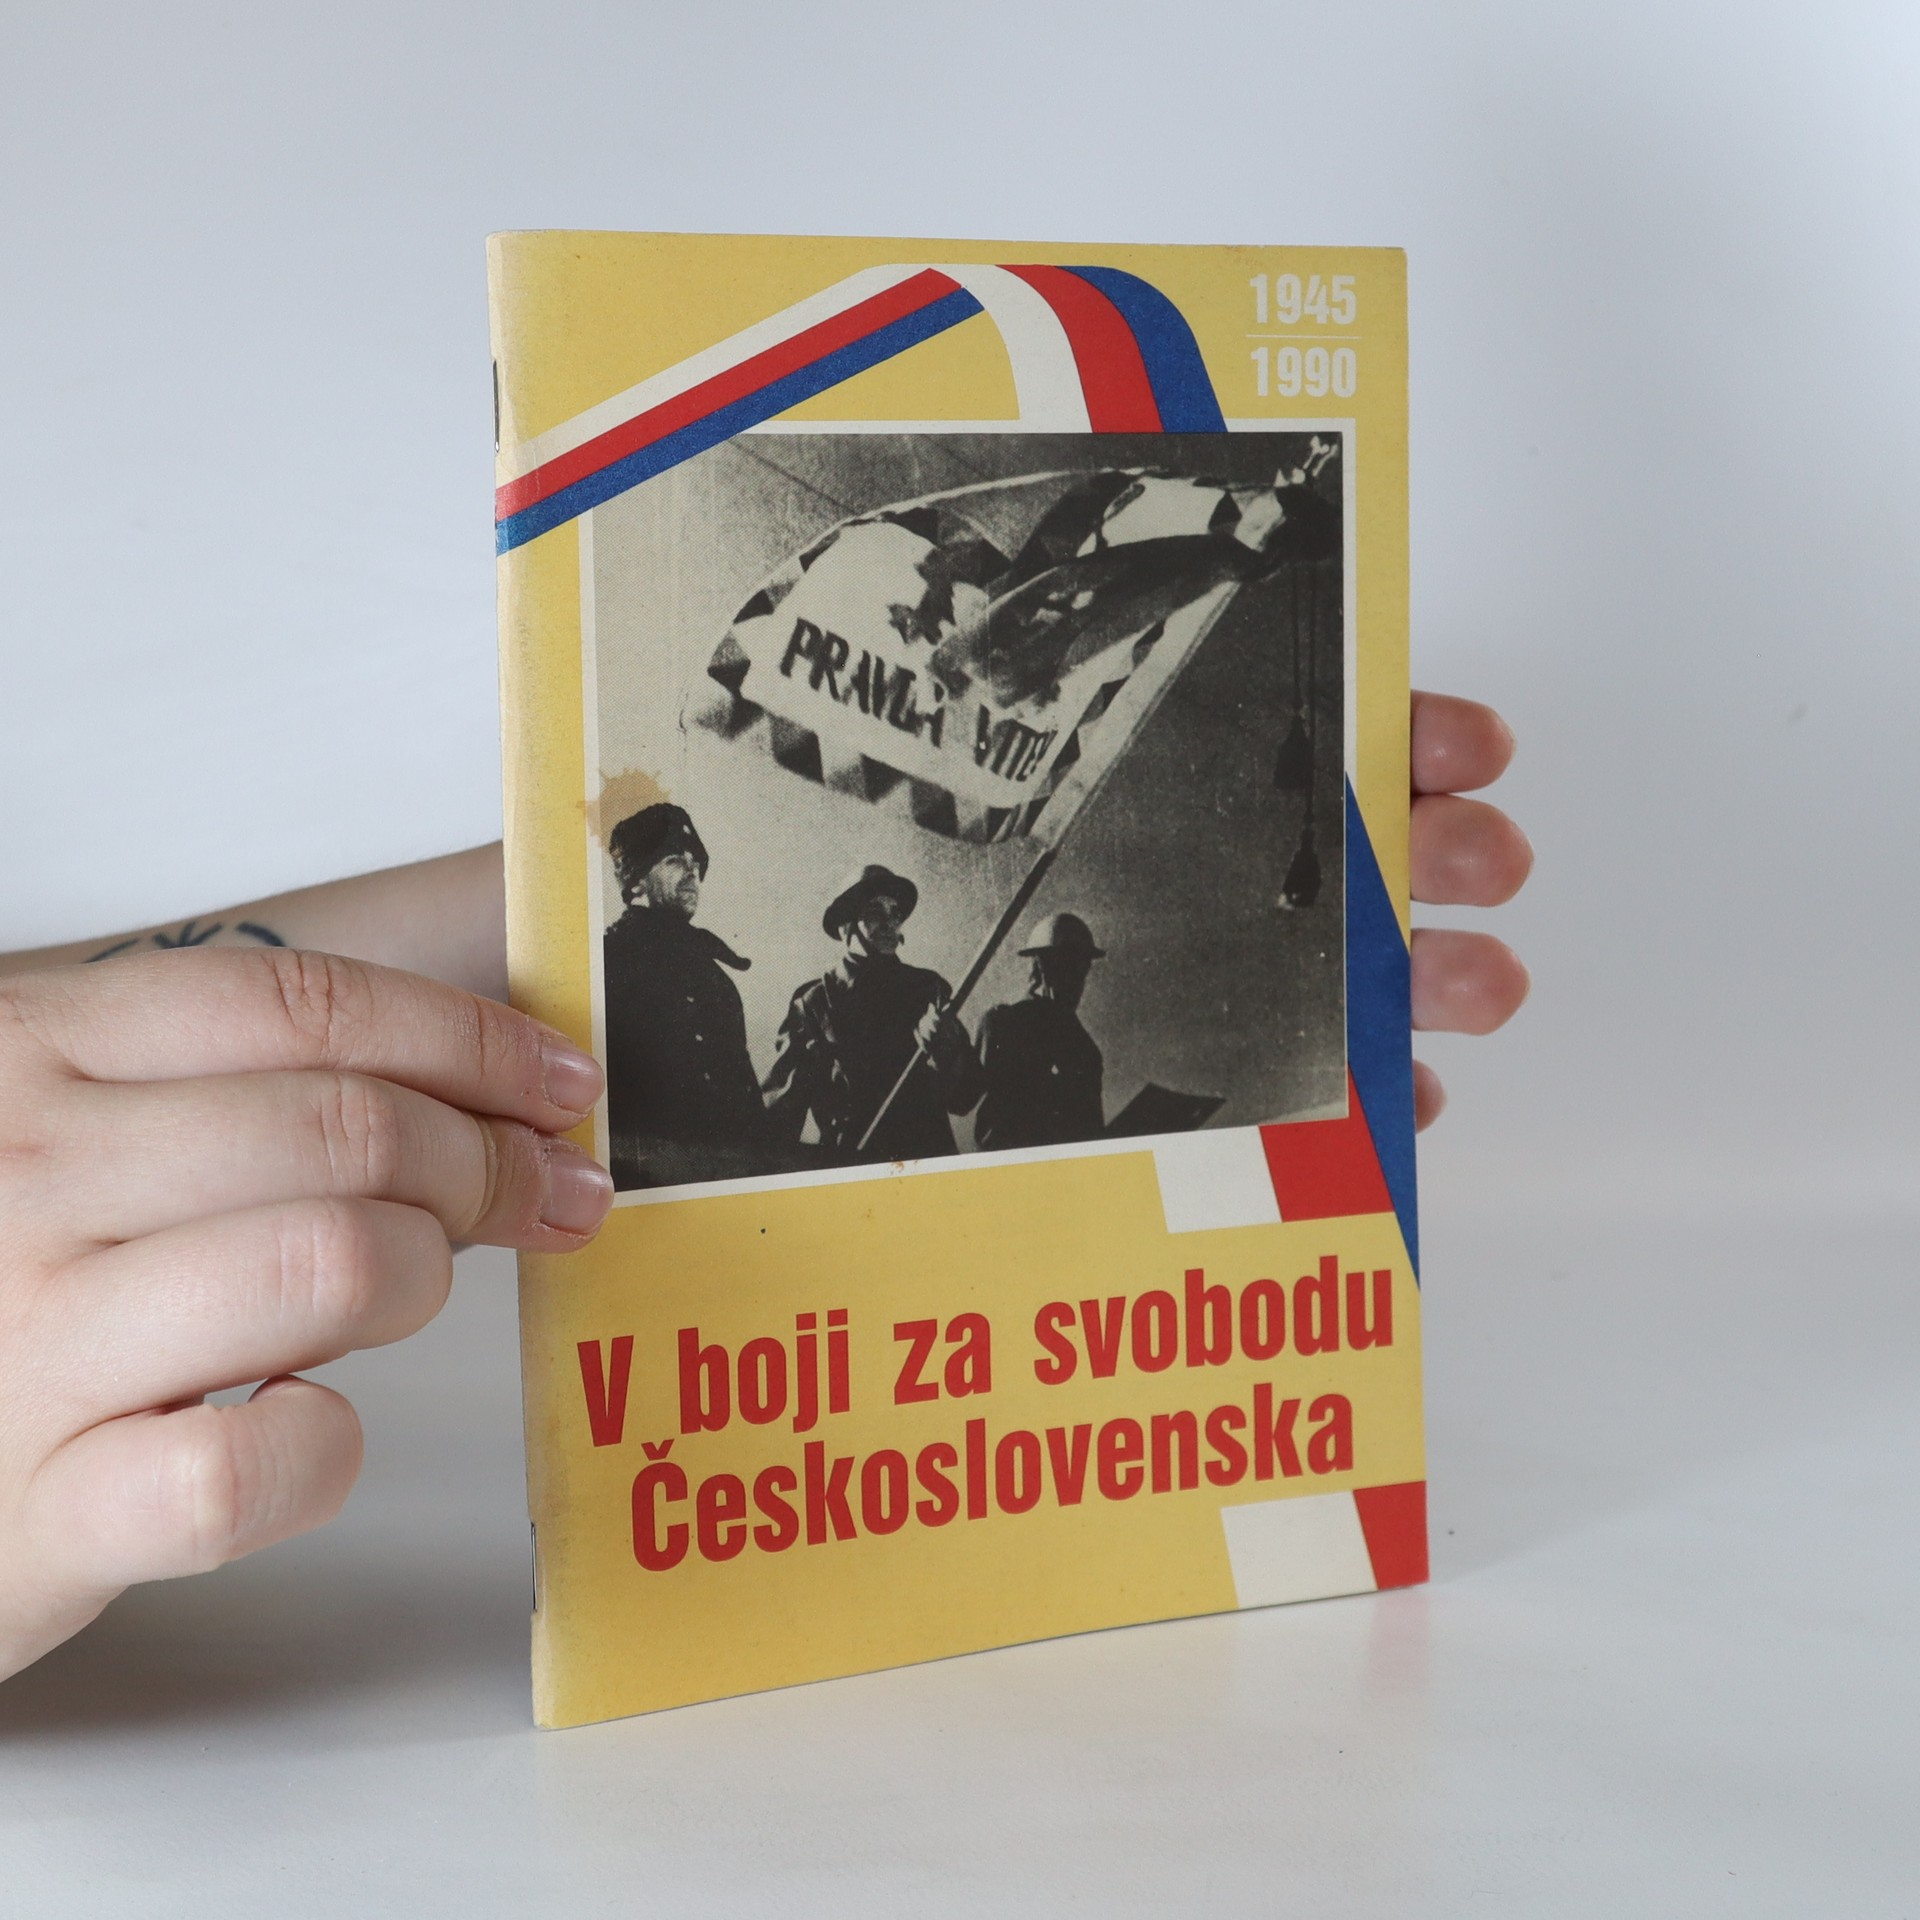 antikvární kniha V boji za svobodu Československa 1945-1990, neuveden